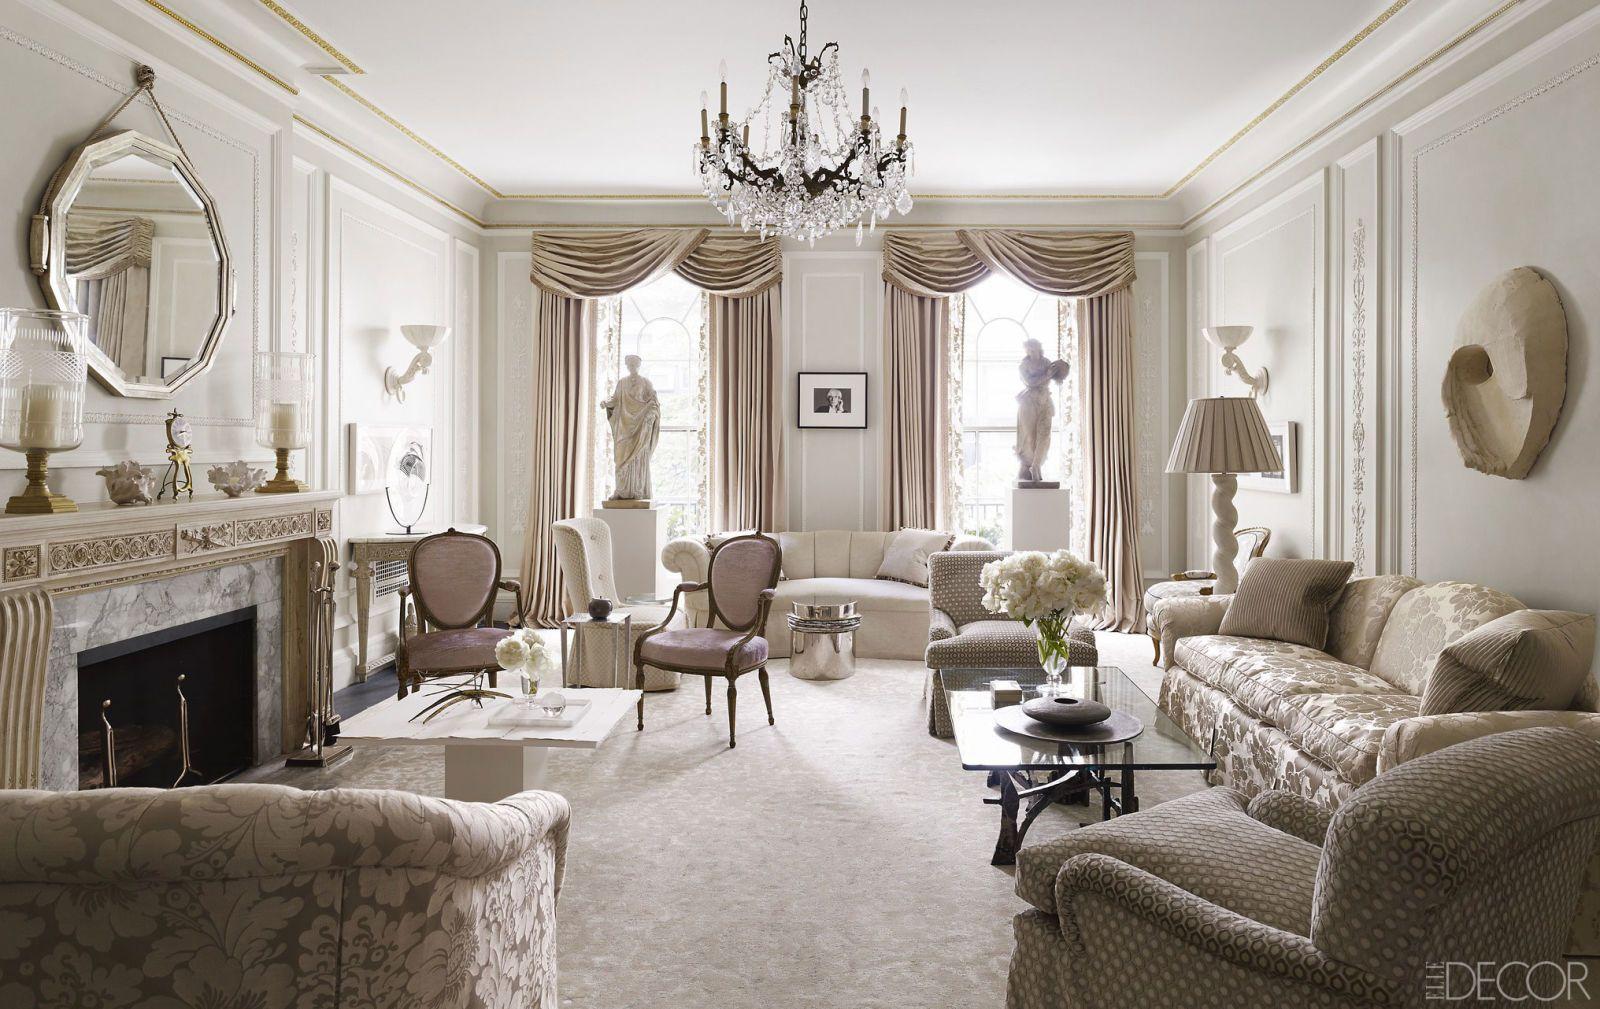 46 white room decorating ideas how to use white wall paint decor rh elledecor com